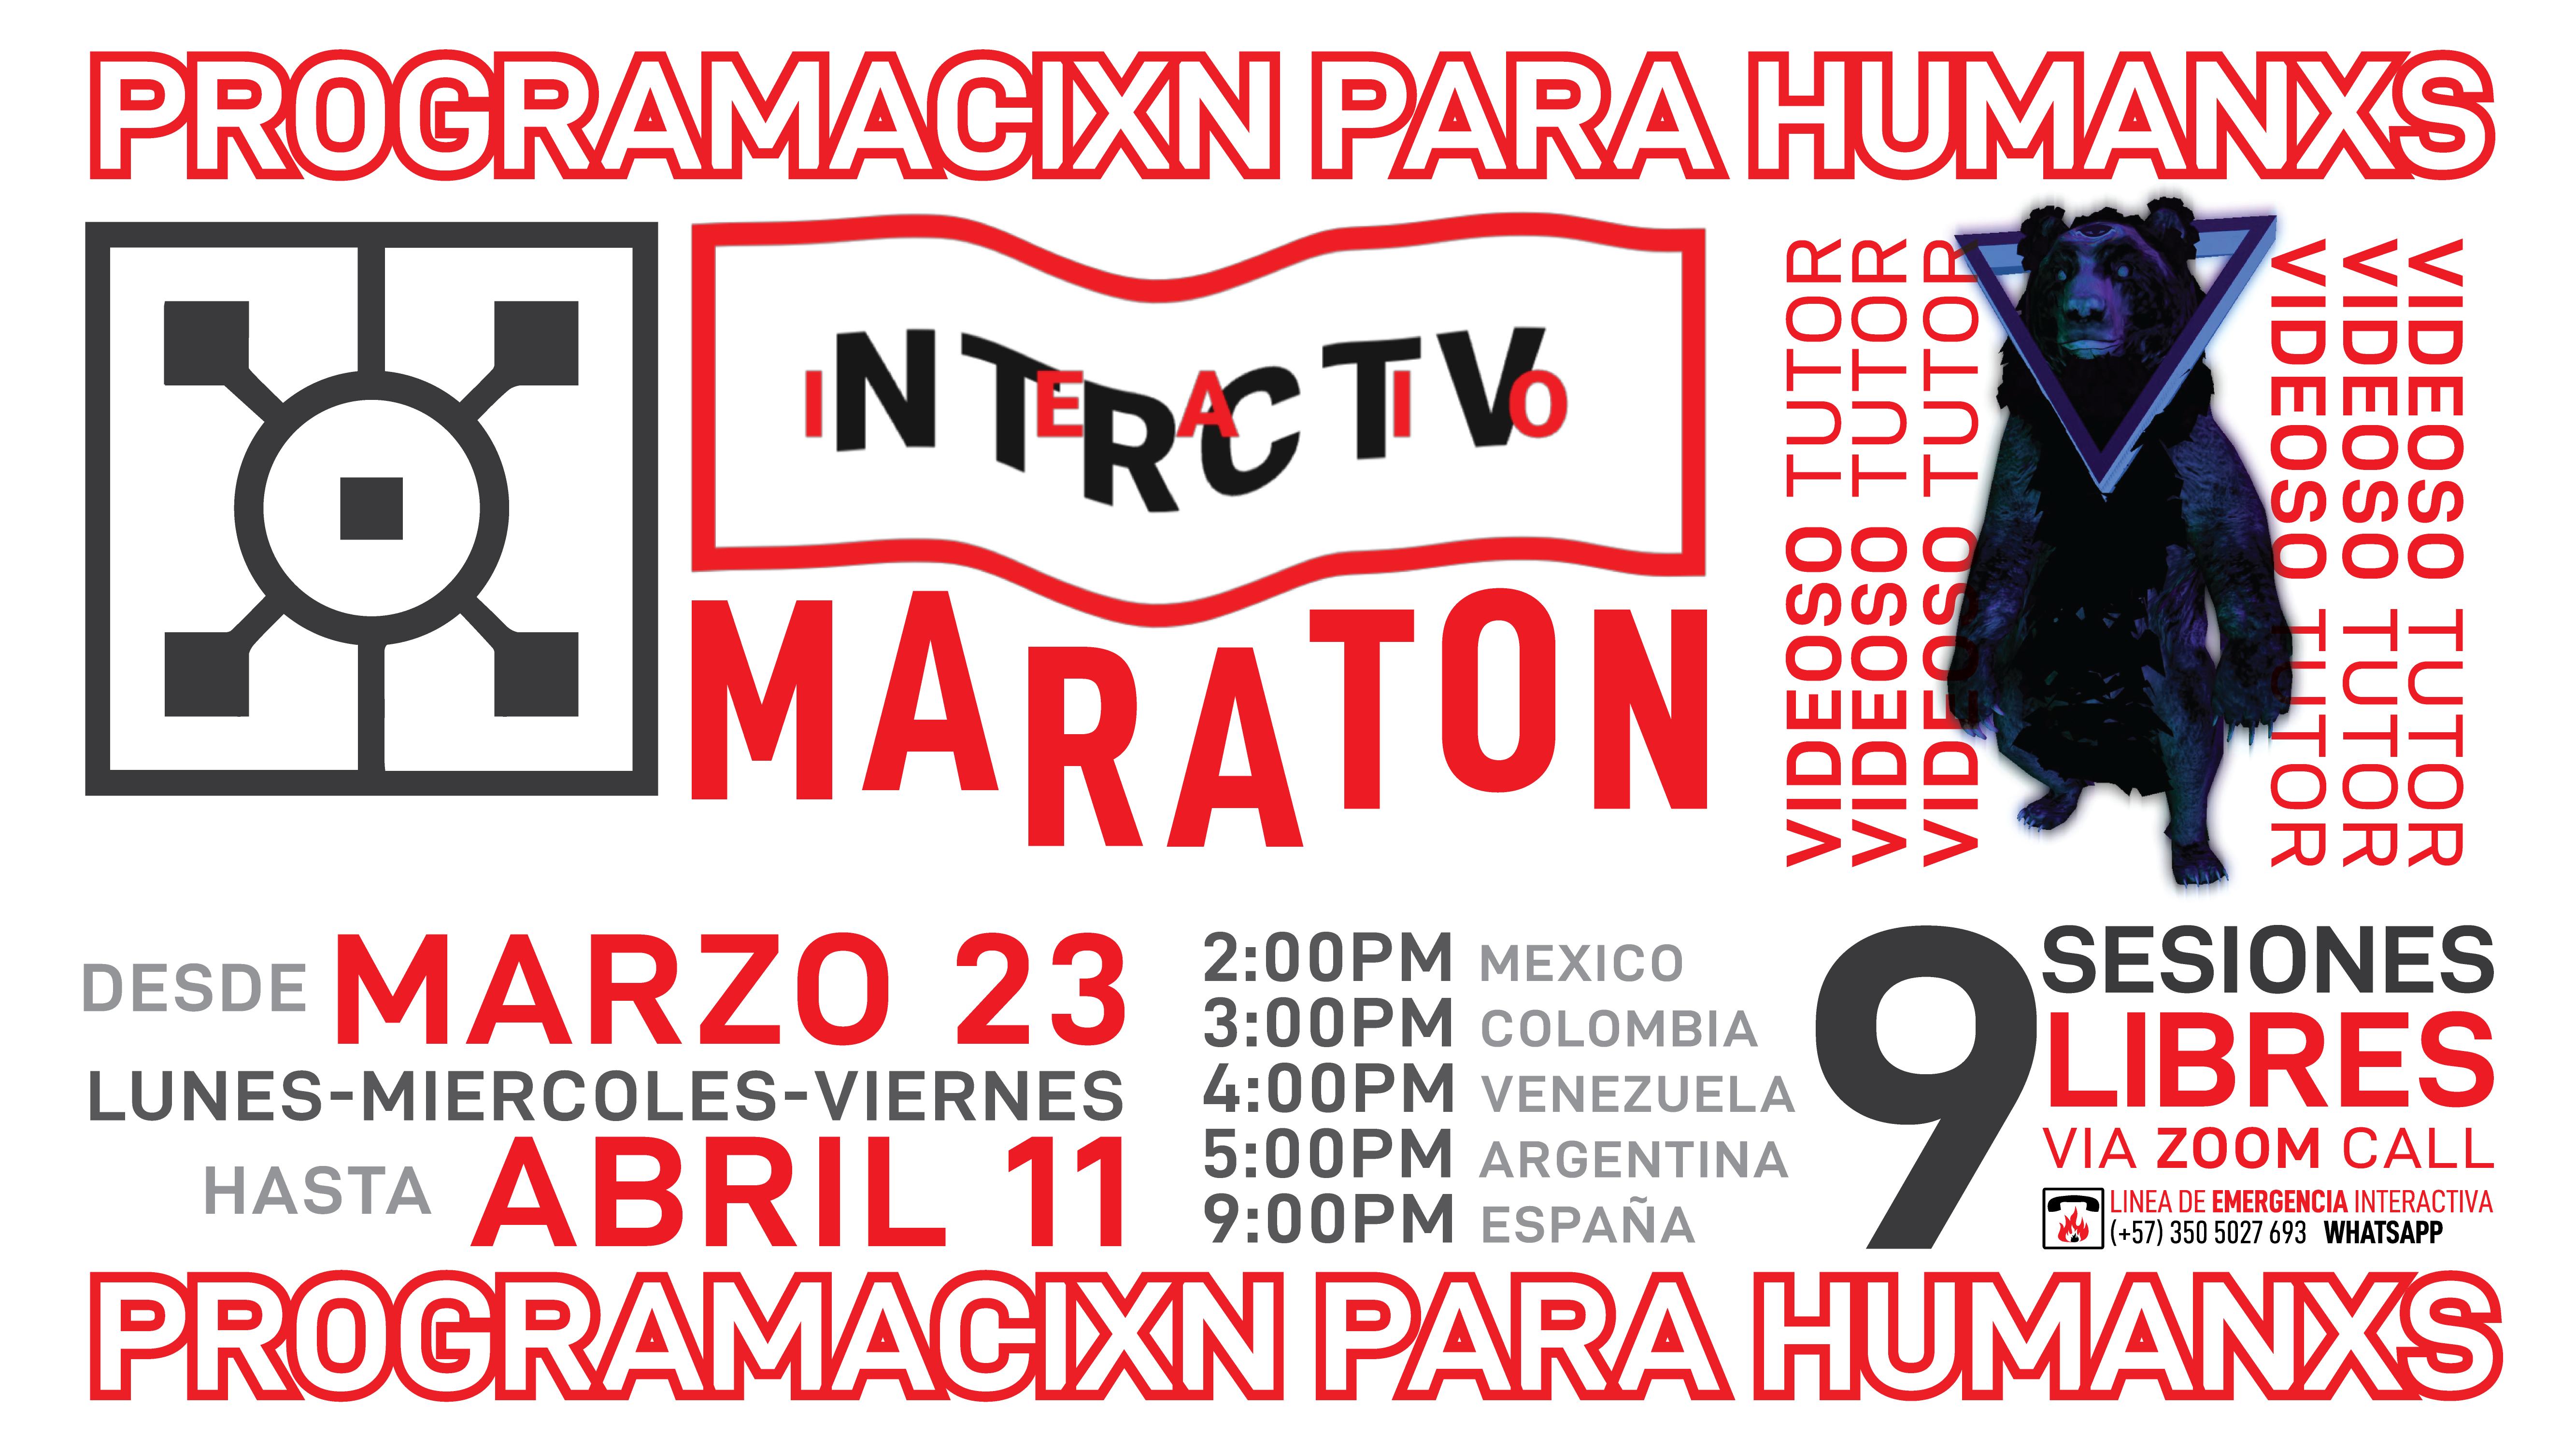 maraton_ntrctv_face-01.png